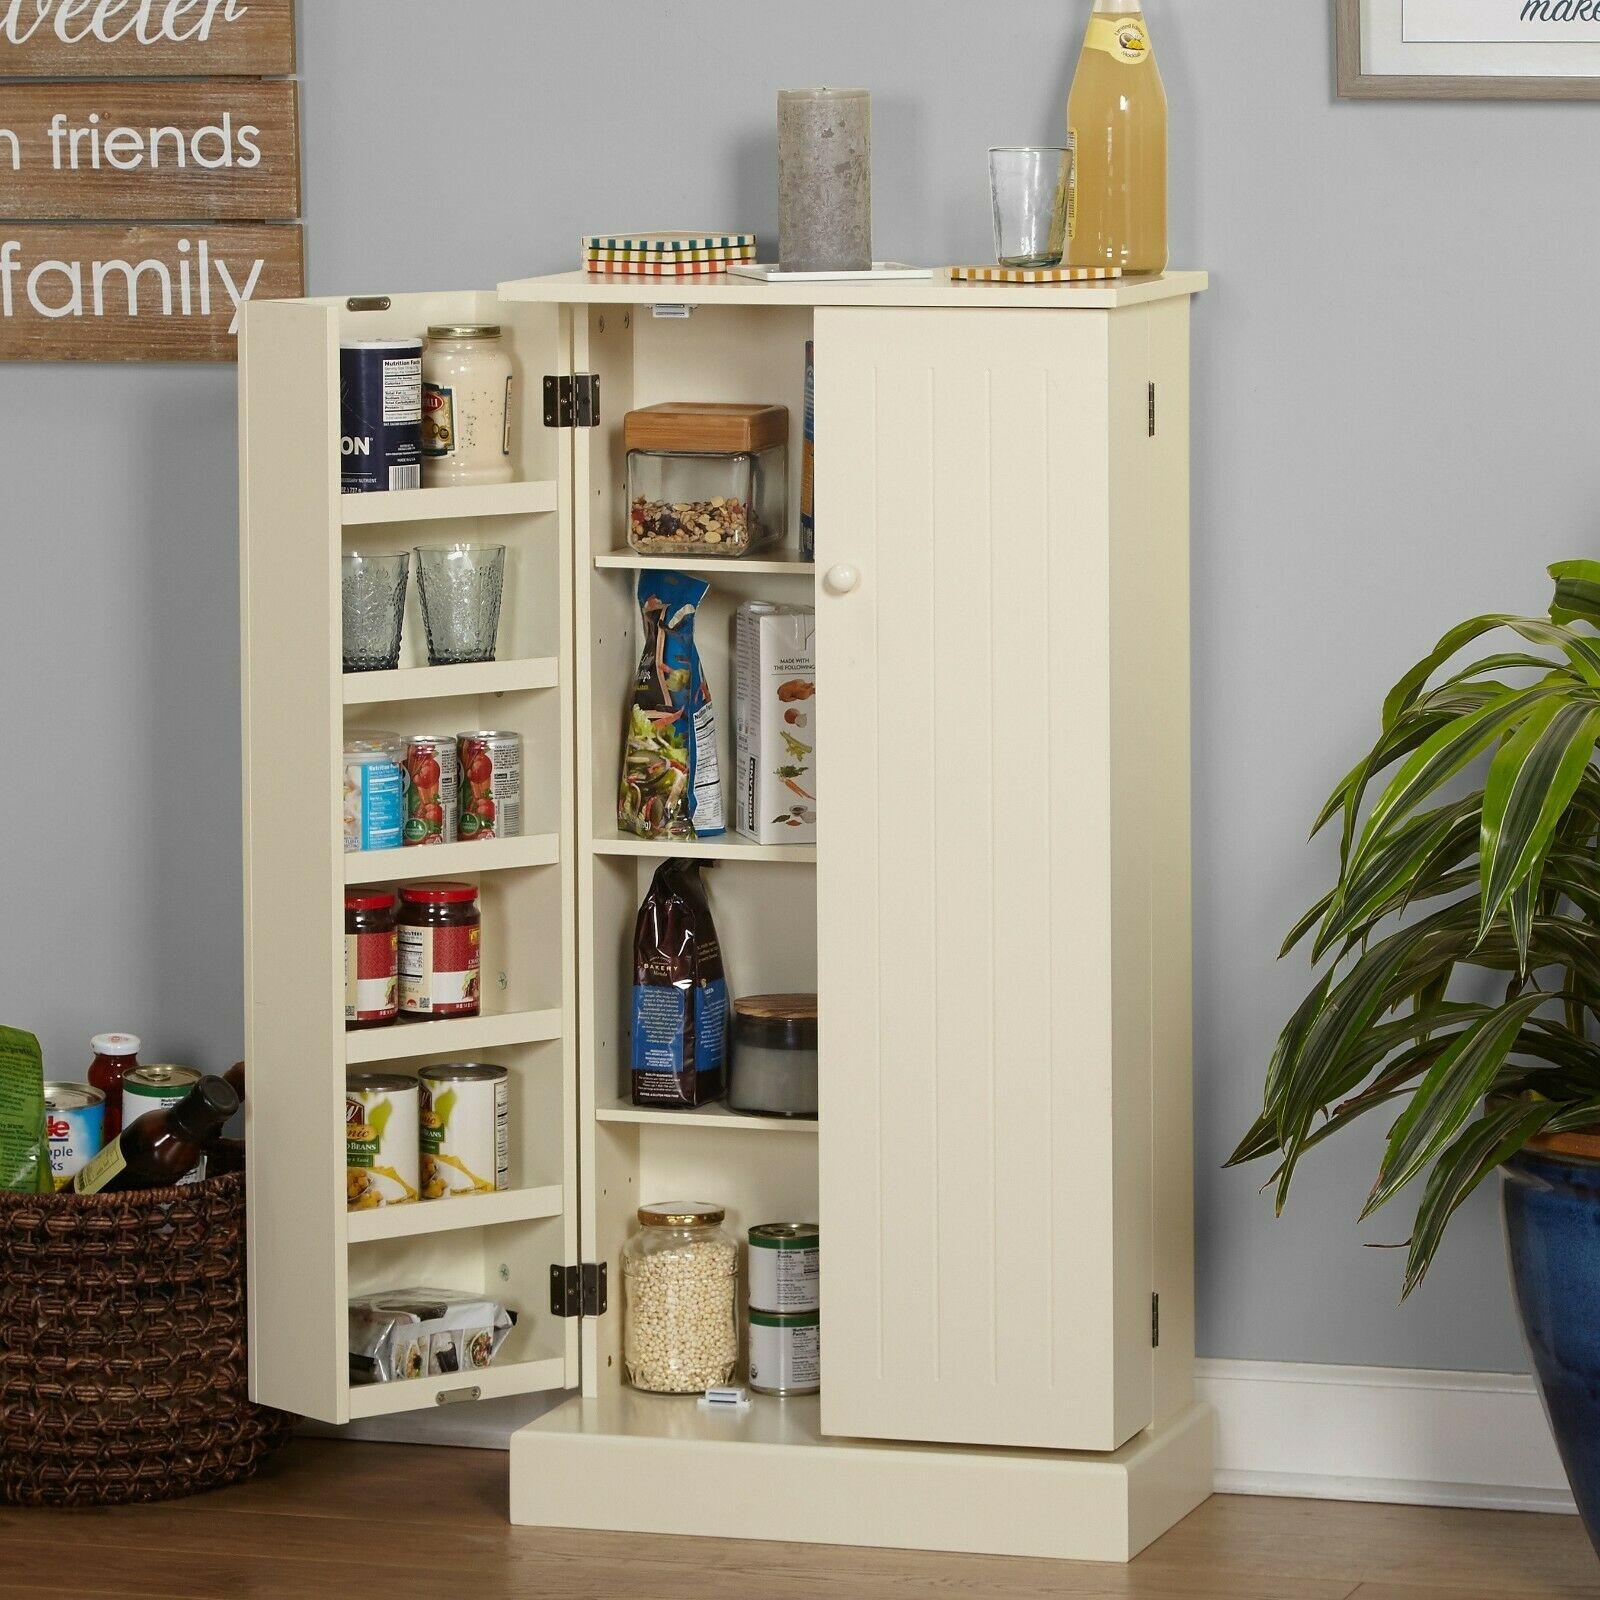 Kitchen Pantry Cabinet Storage Food Cupboard 16 Shelves Wooden Rack White Shelf 1